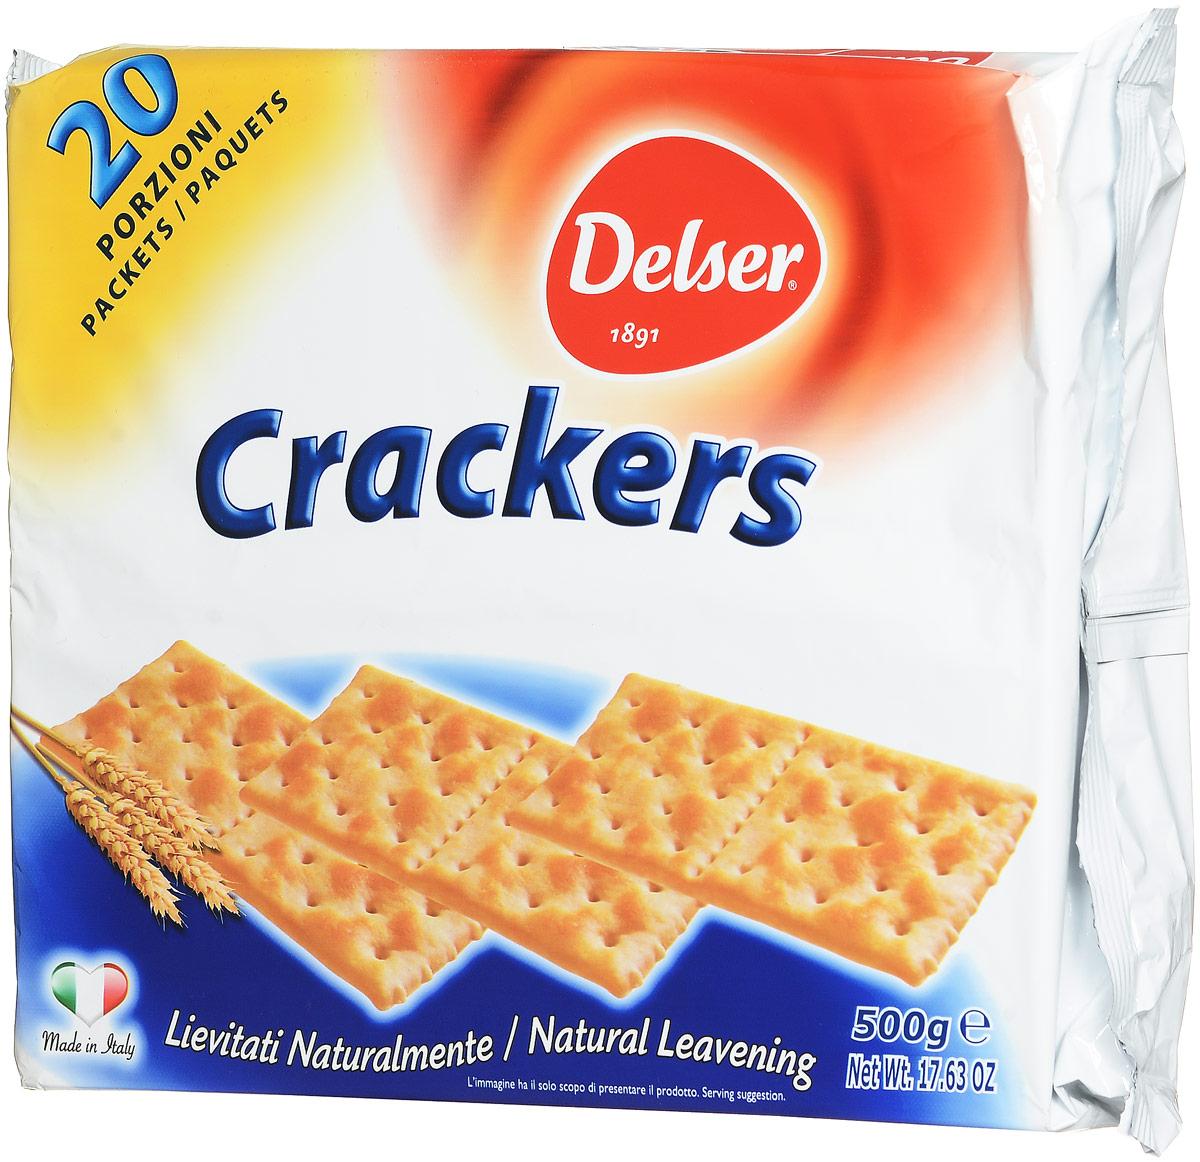 Delser крекеры, 500 г 0451